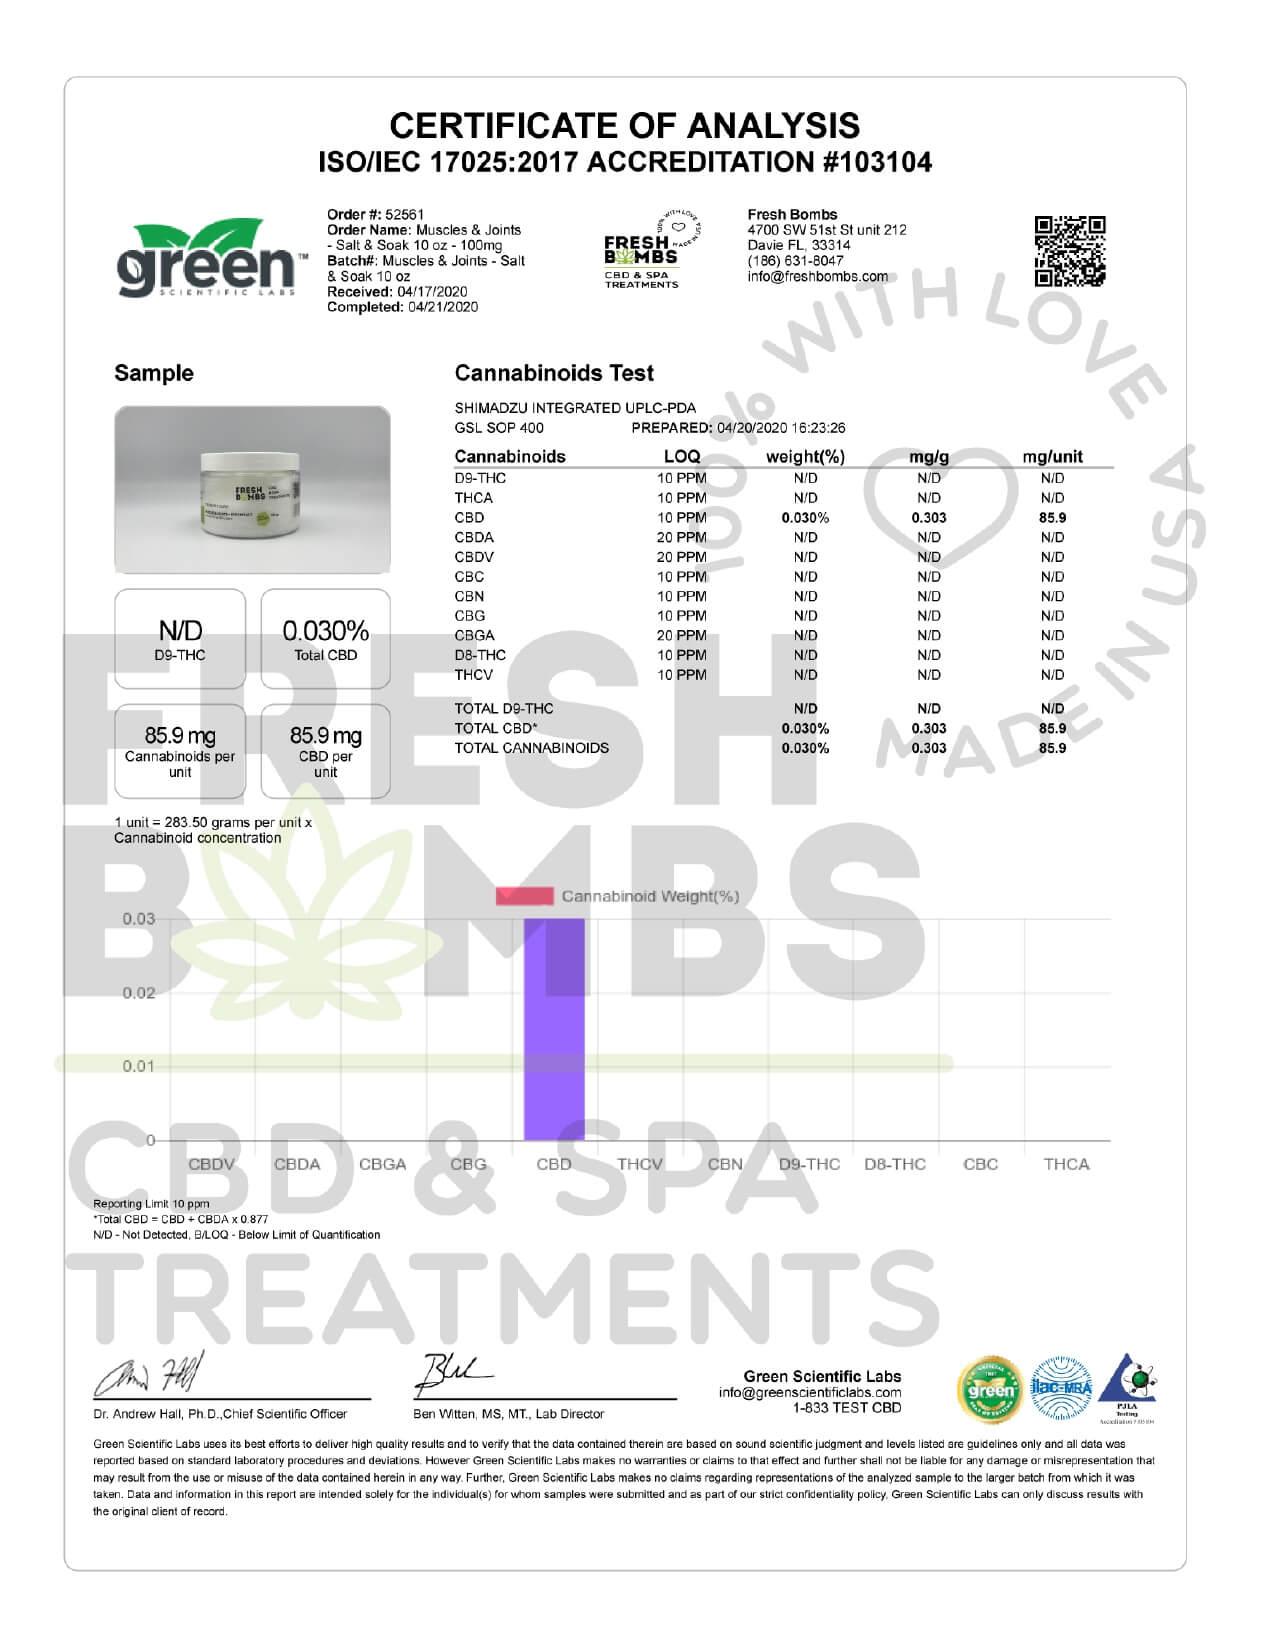 Fresh Bombs CBD Bath Muscle and Joint Bath Soak 10oz 100mg Lab Report